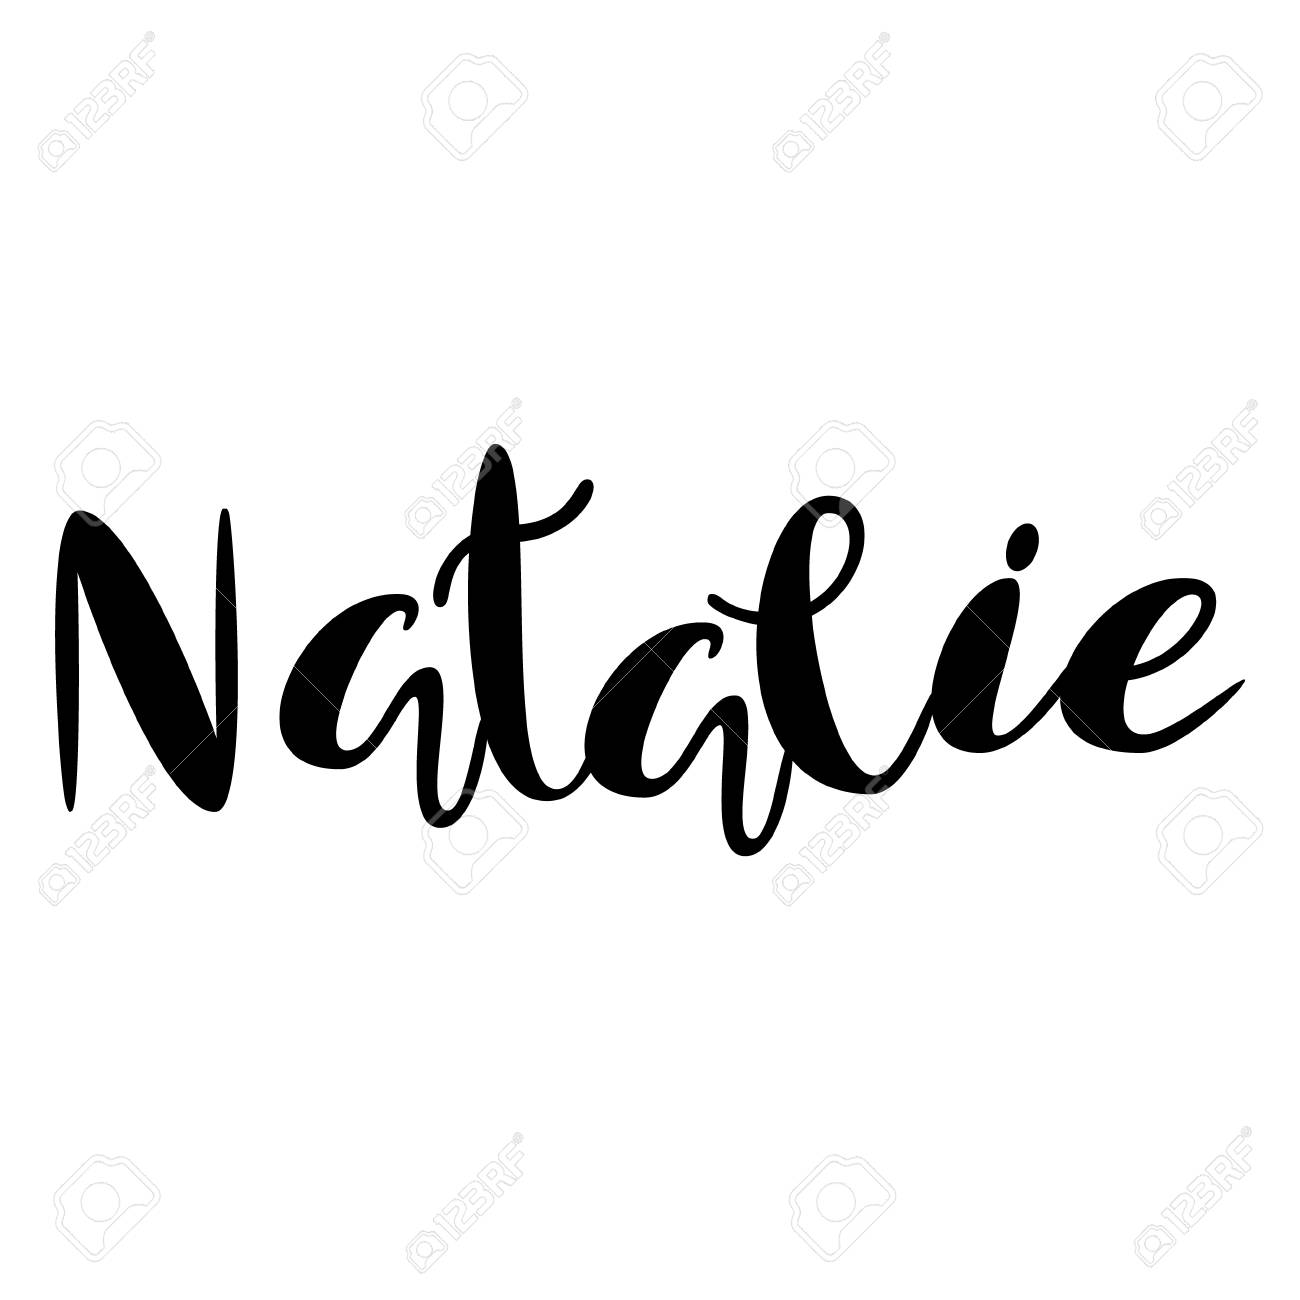 Natalie Text